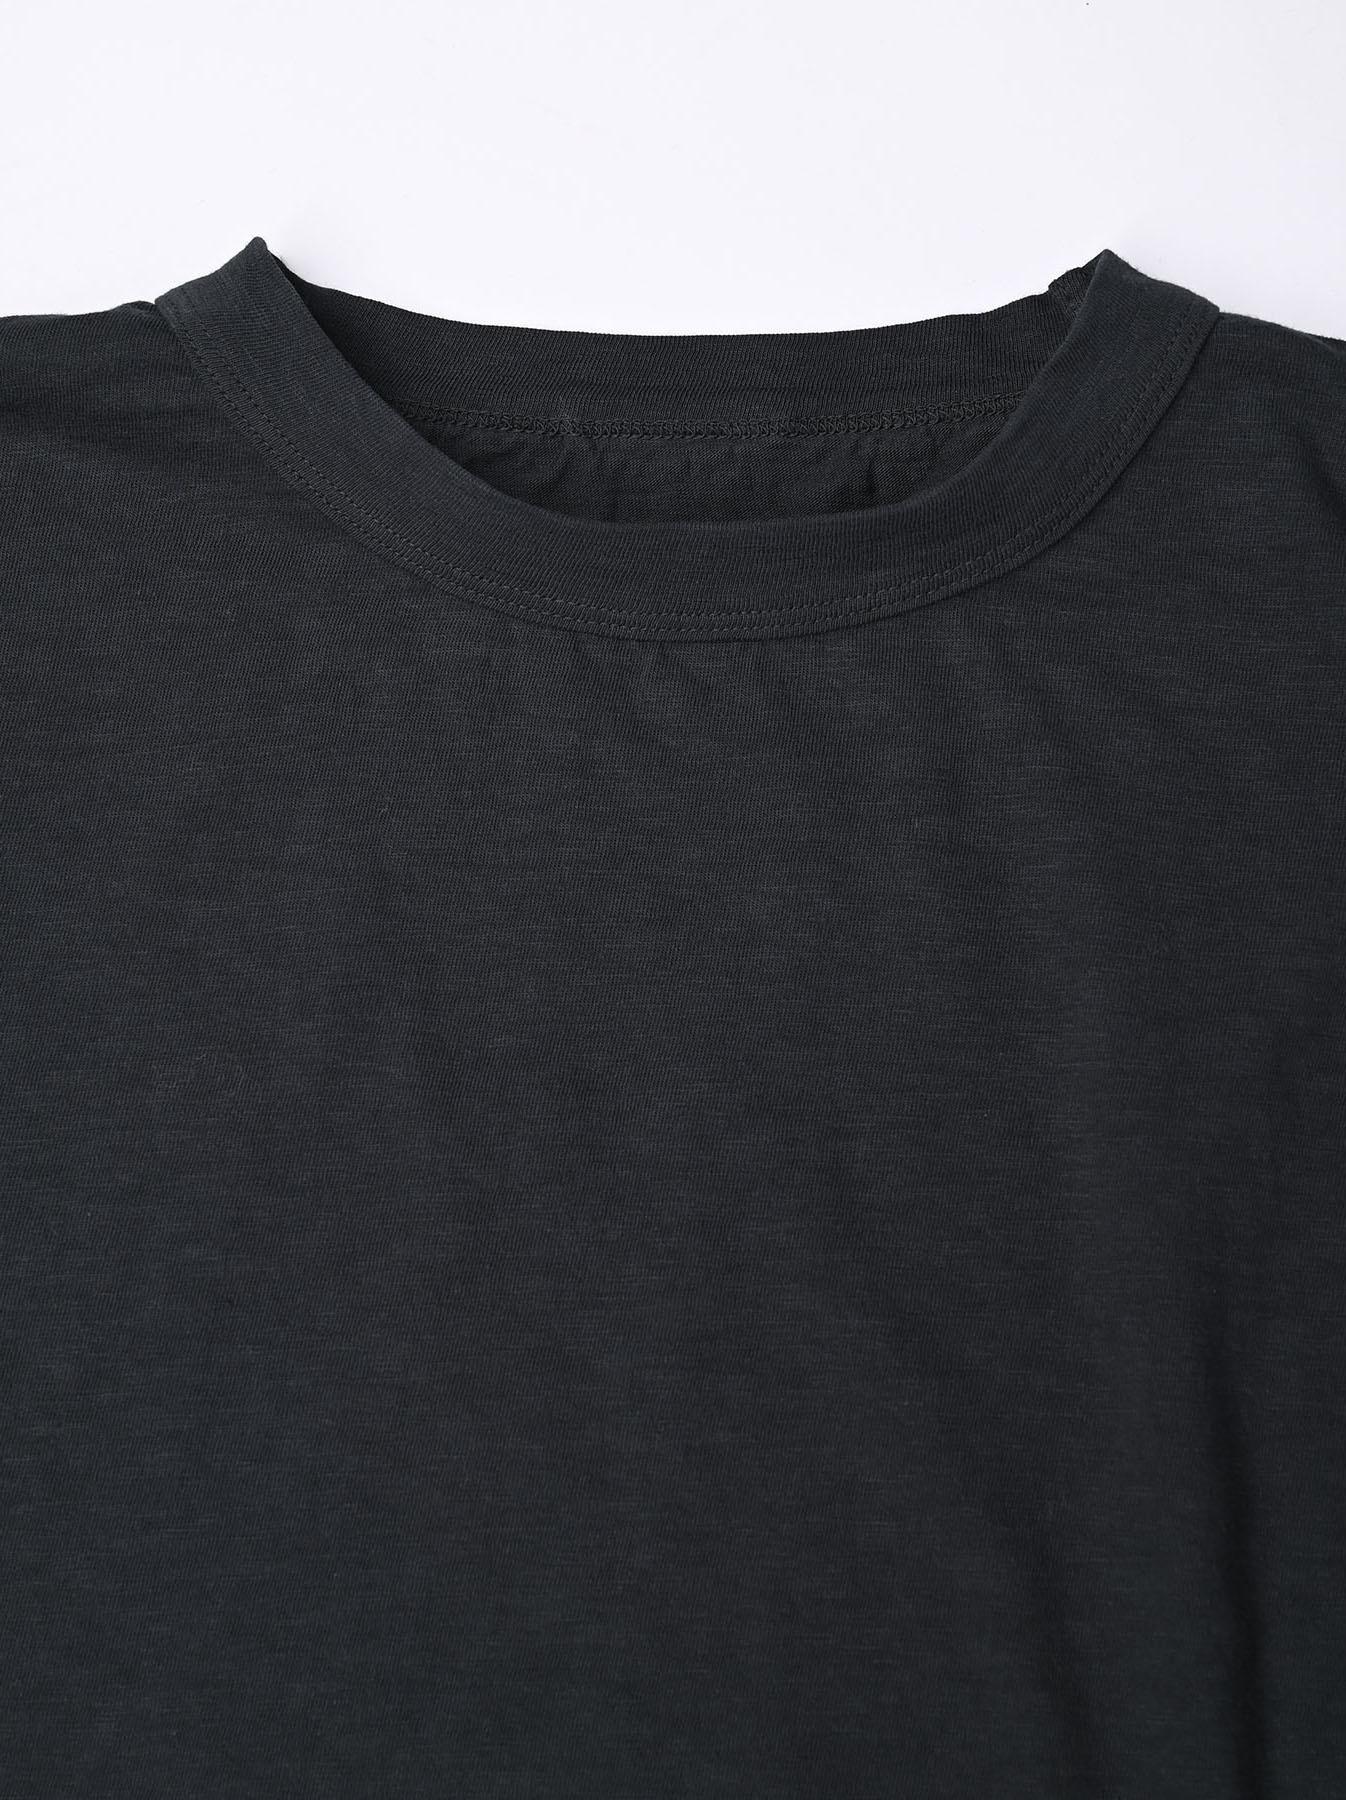 Zimbabwe Cotton Ocean Long-sleeved T-shirt-7